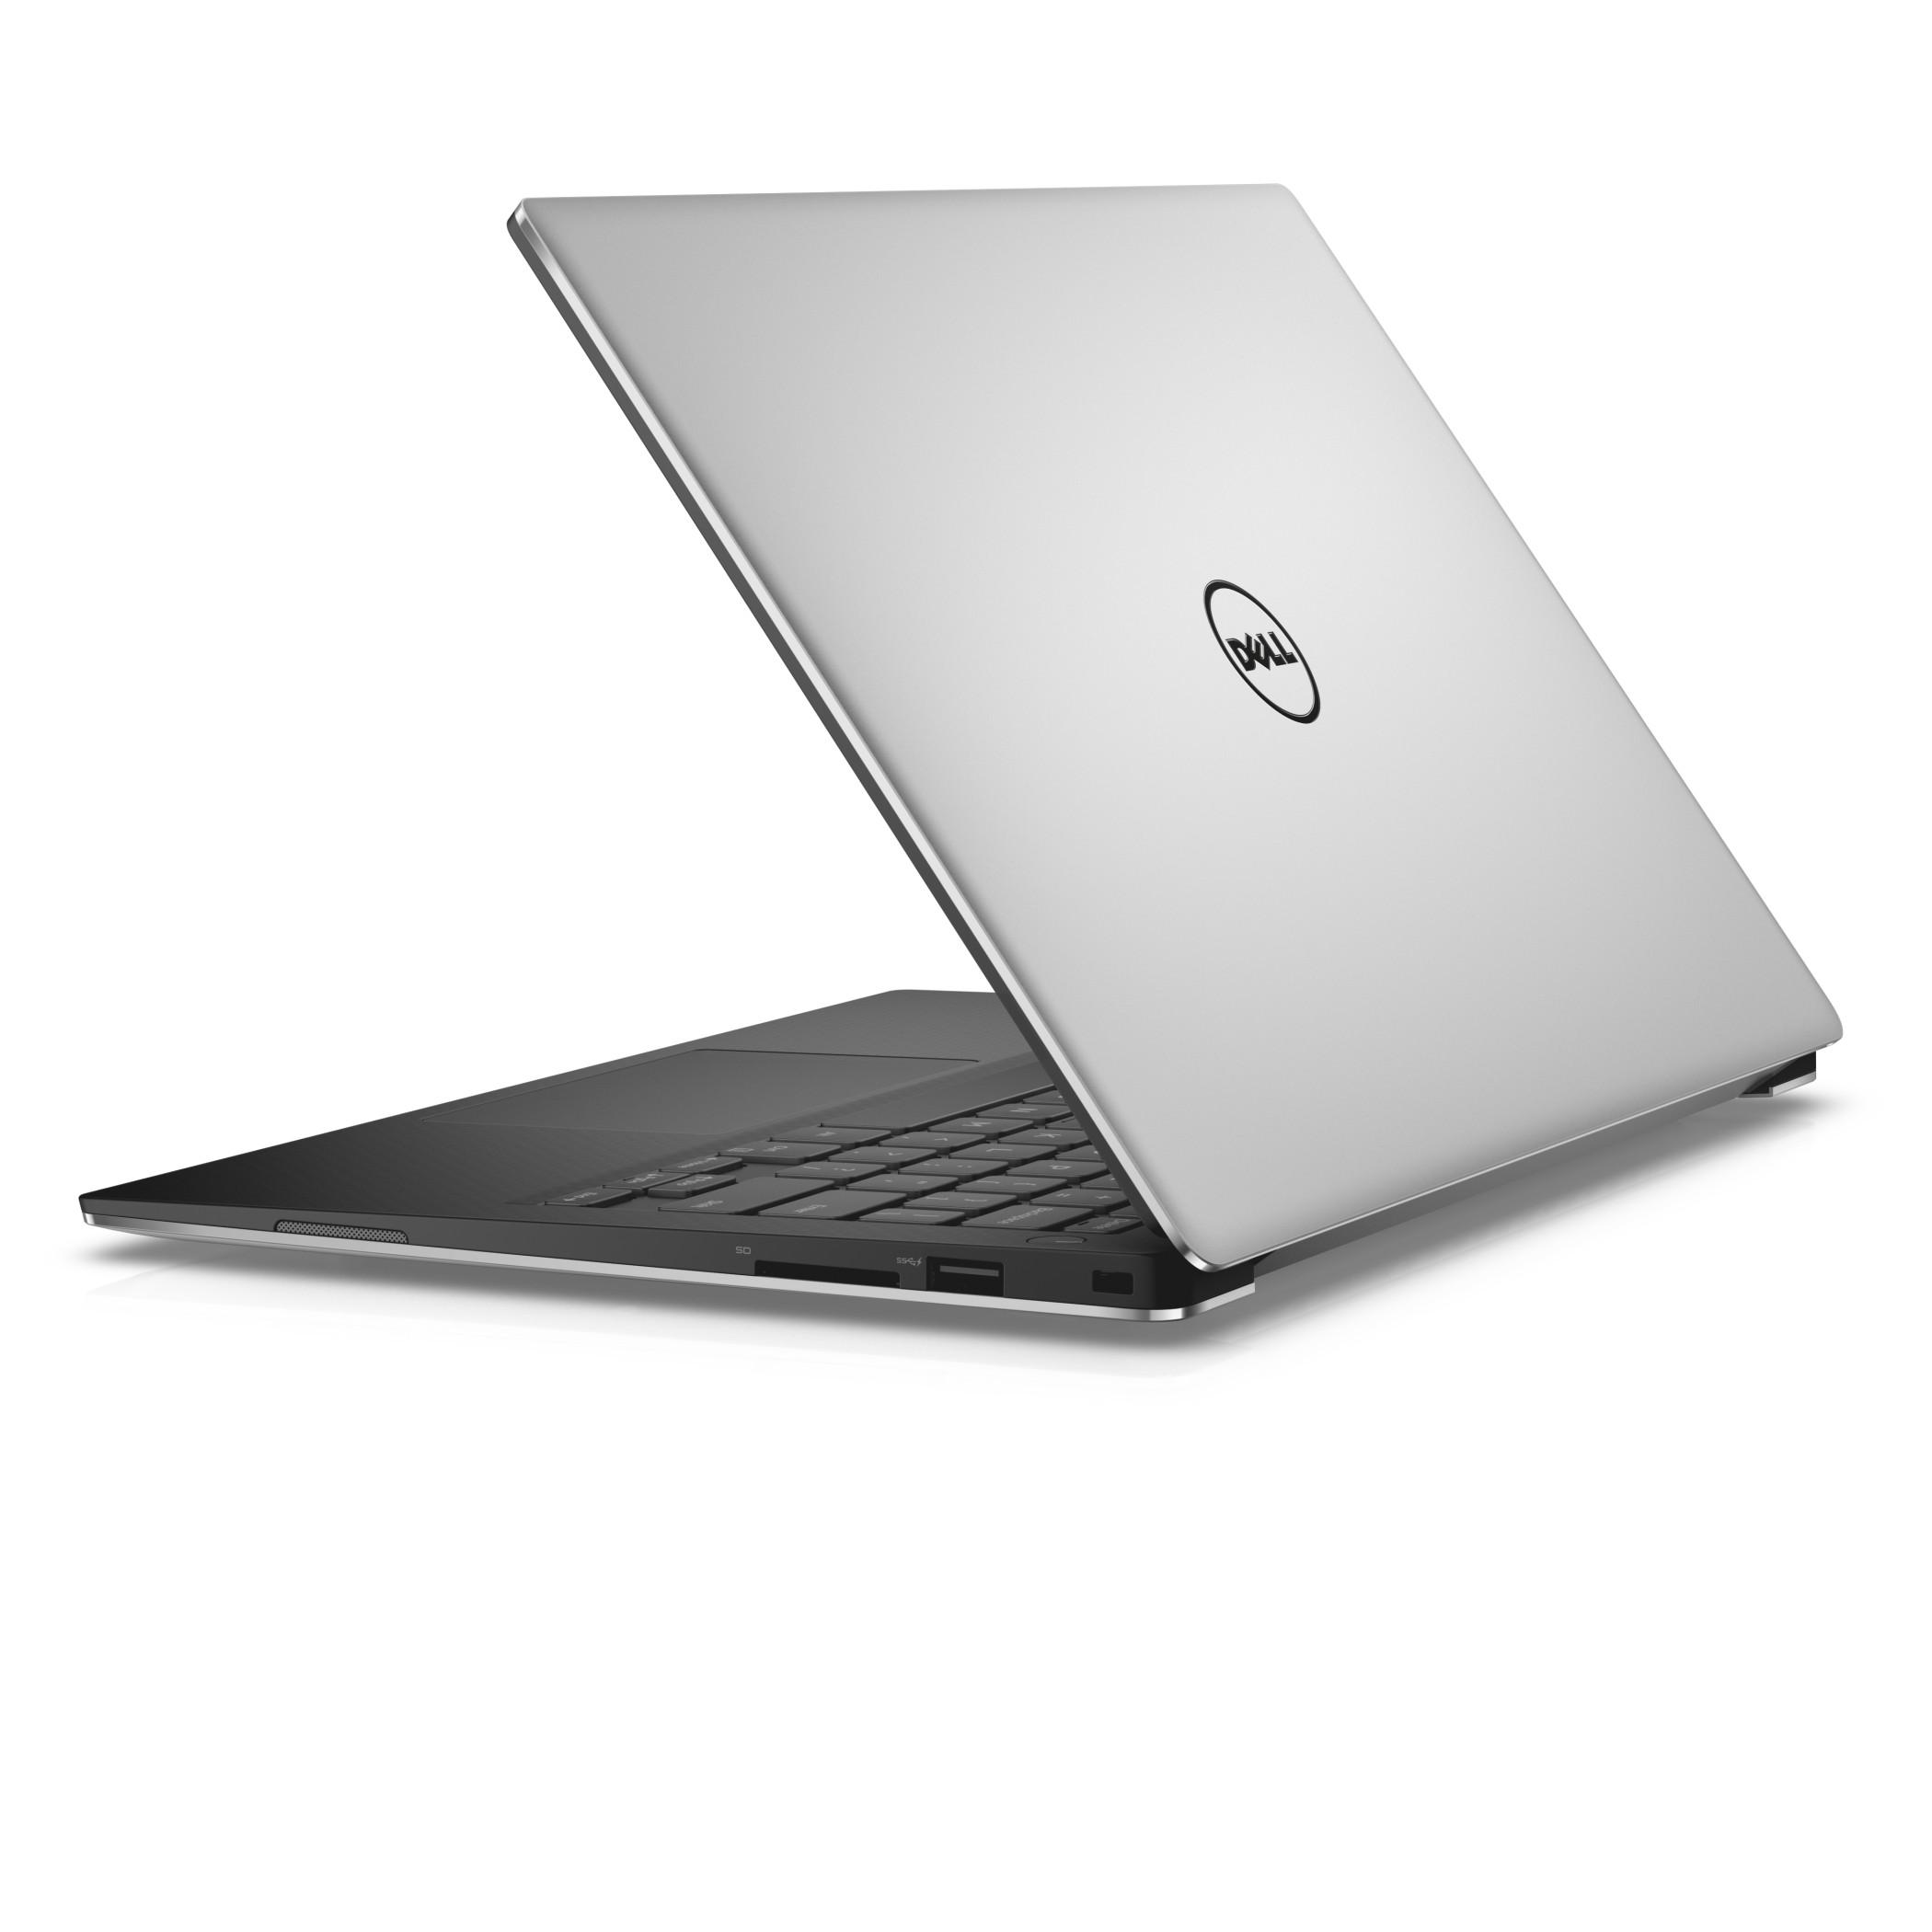 "Dell XPS 13 9350 13"" FHD i7-6600U/8G/256SSD/HD/MCR/USB/THB/W10/2RNBD/Stříbrný"